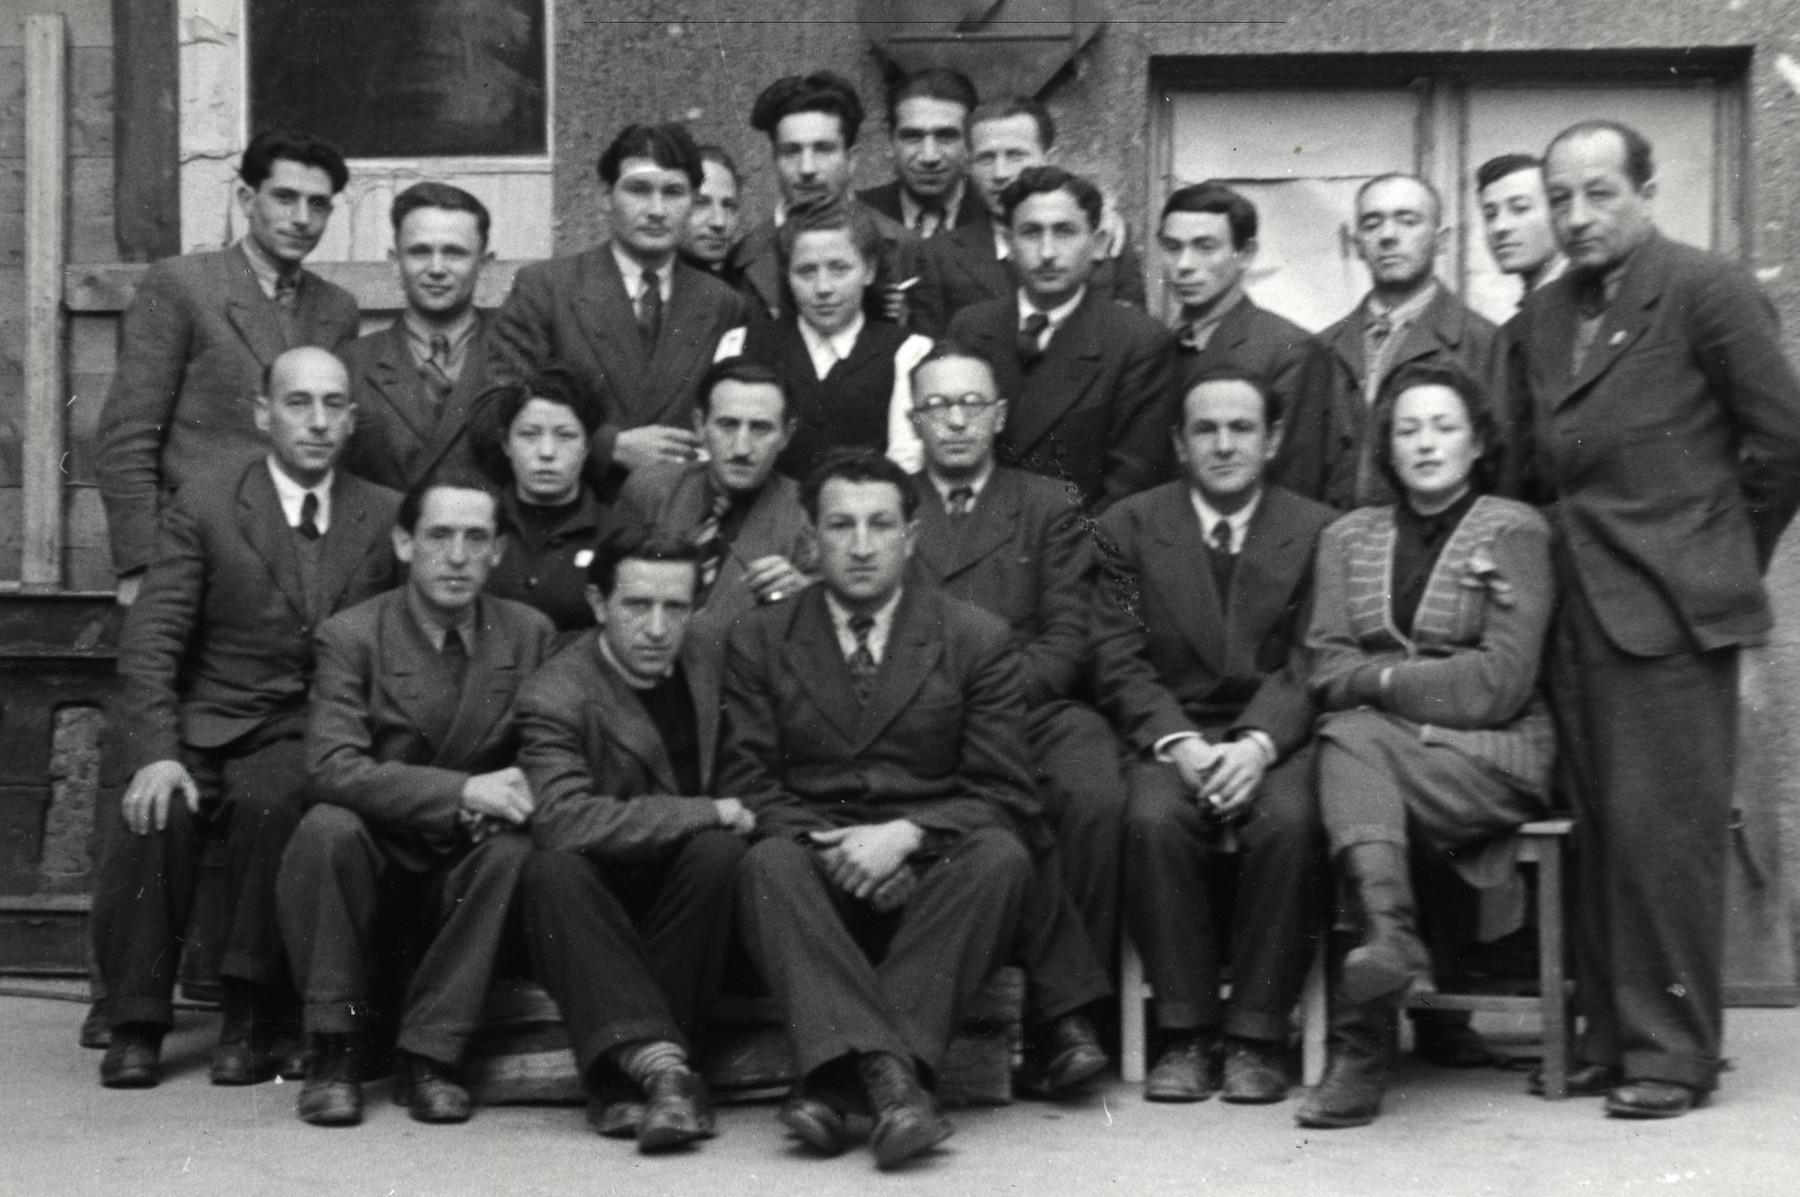 Staff of the newspaper, Unzer Weg.